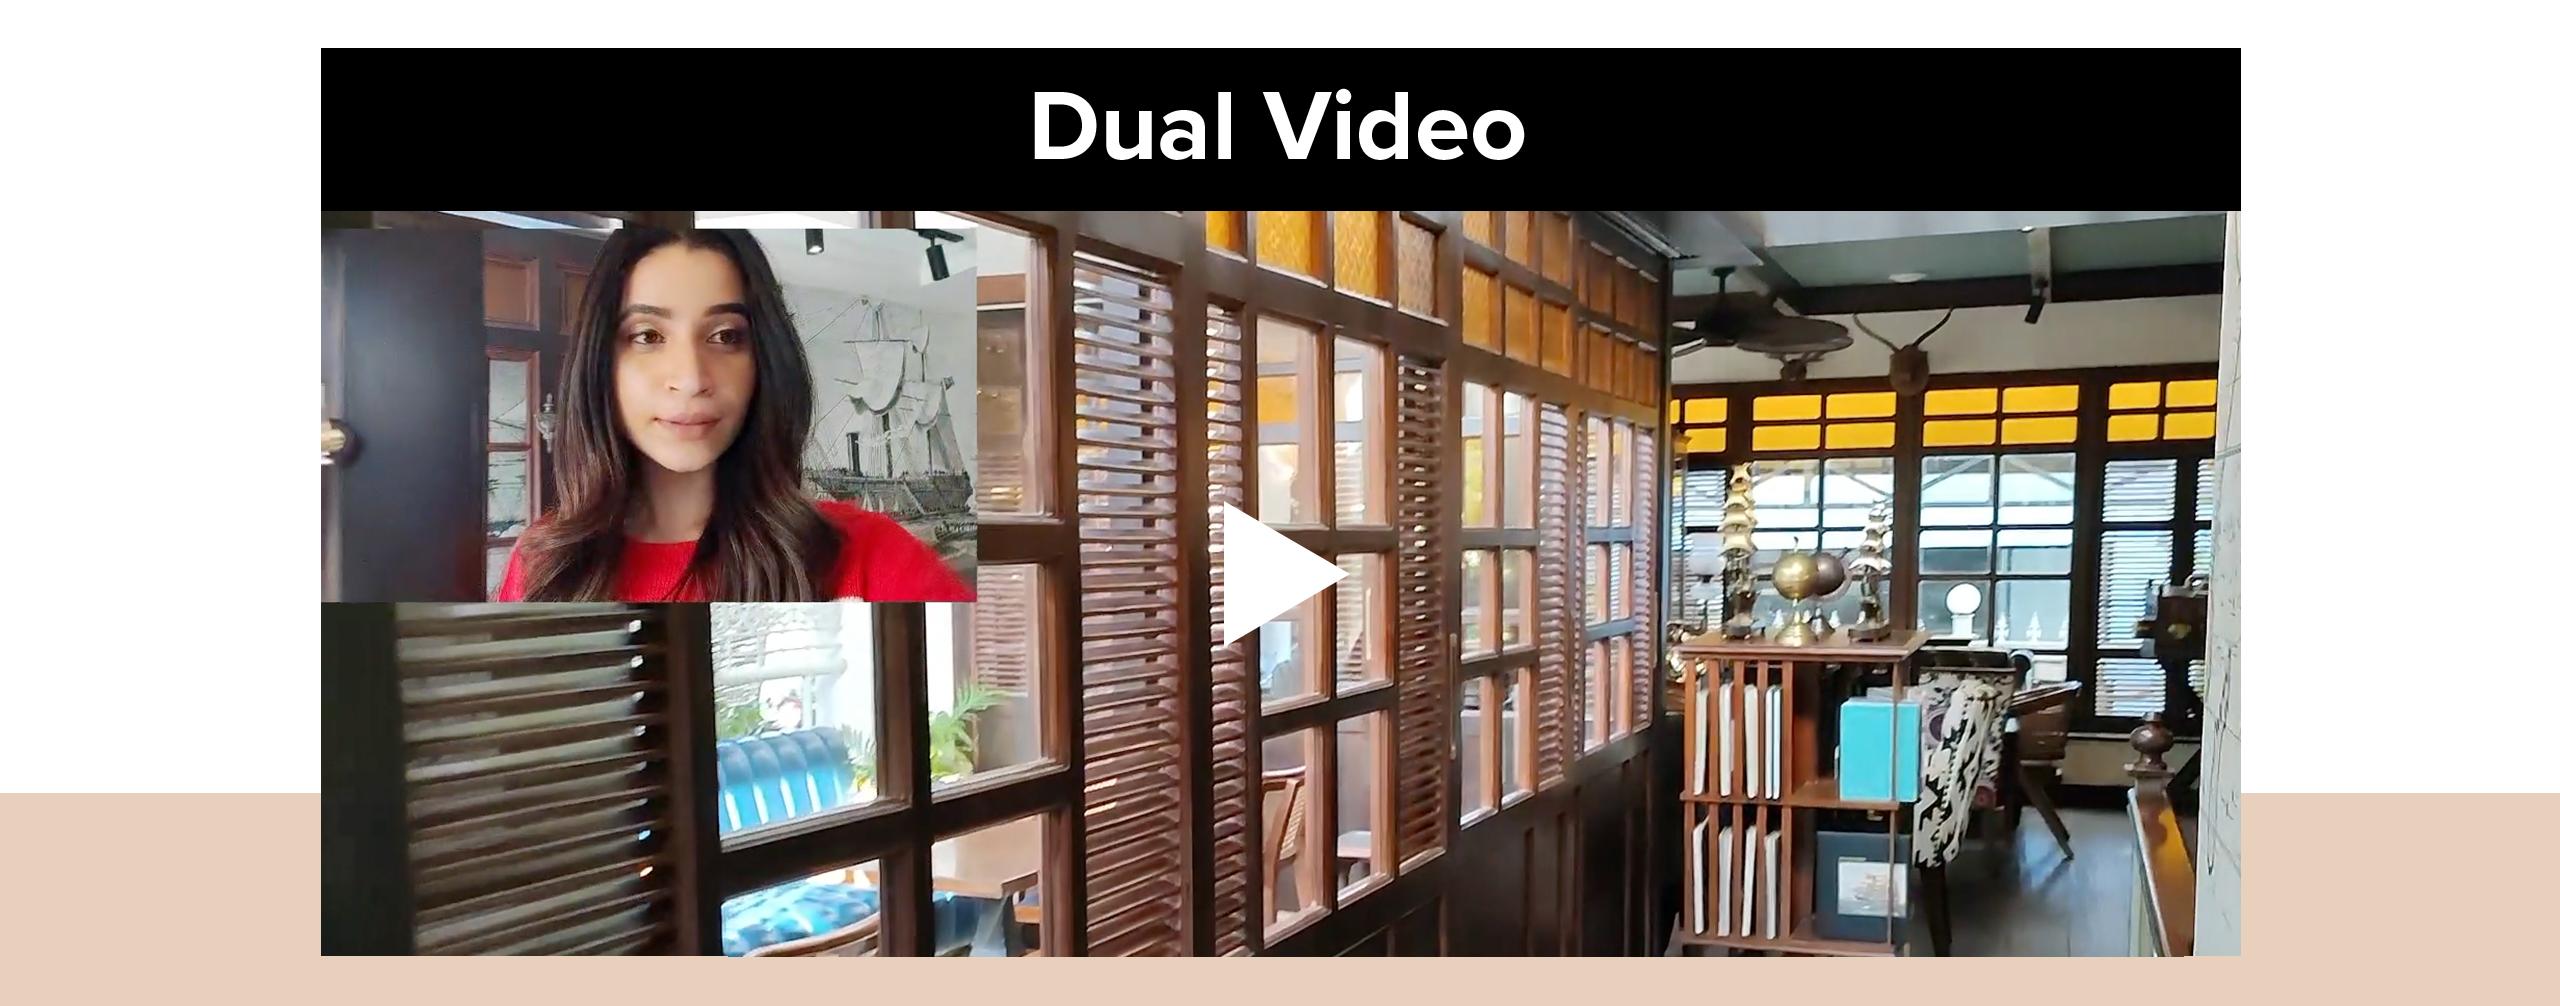 redmi note 10 pro dual video